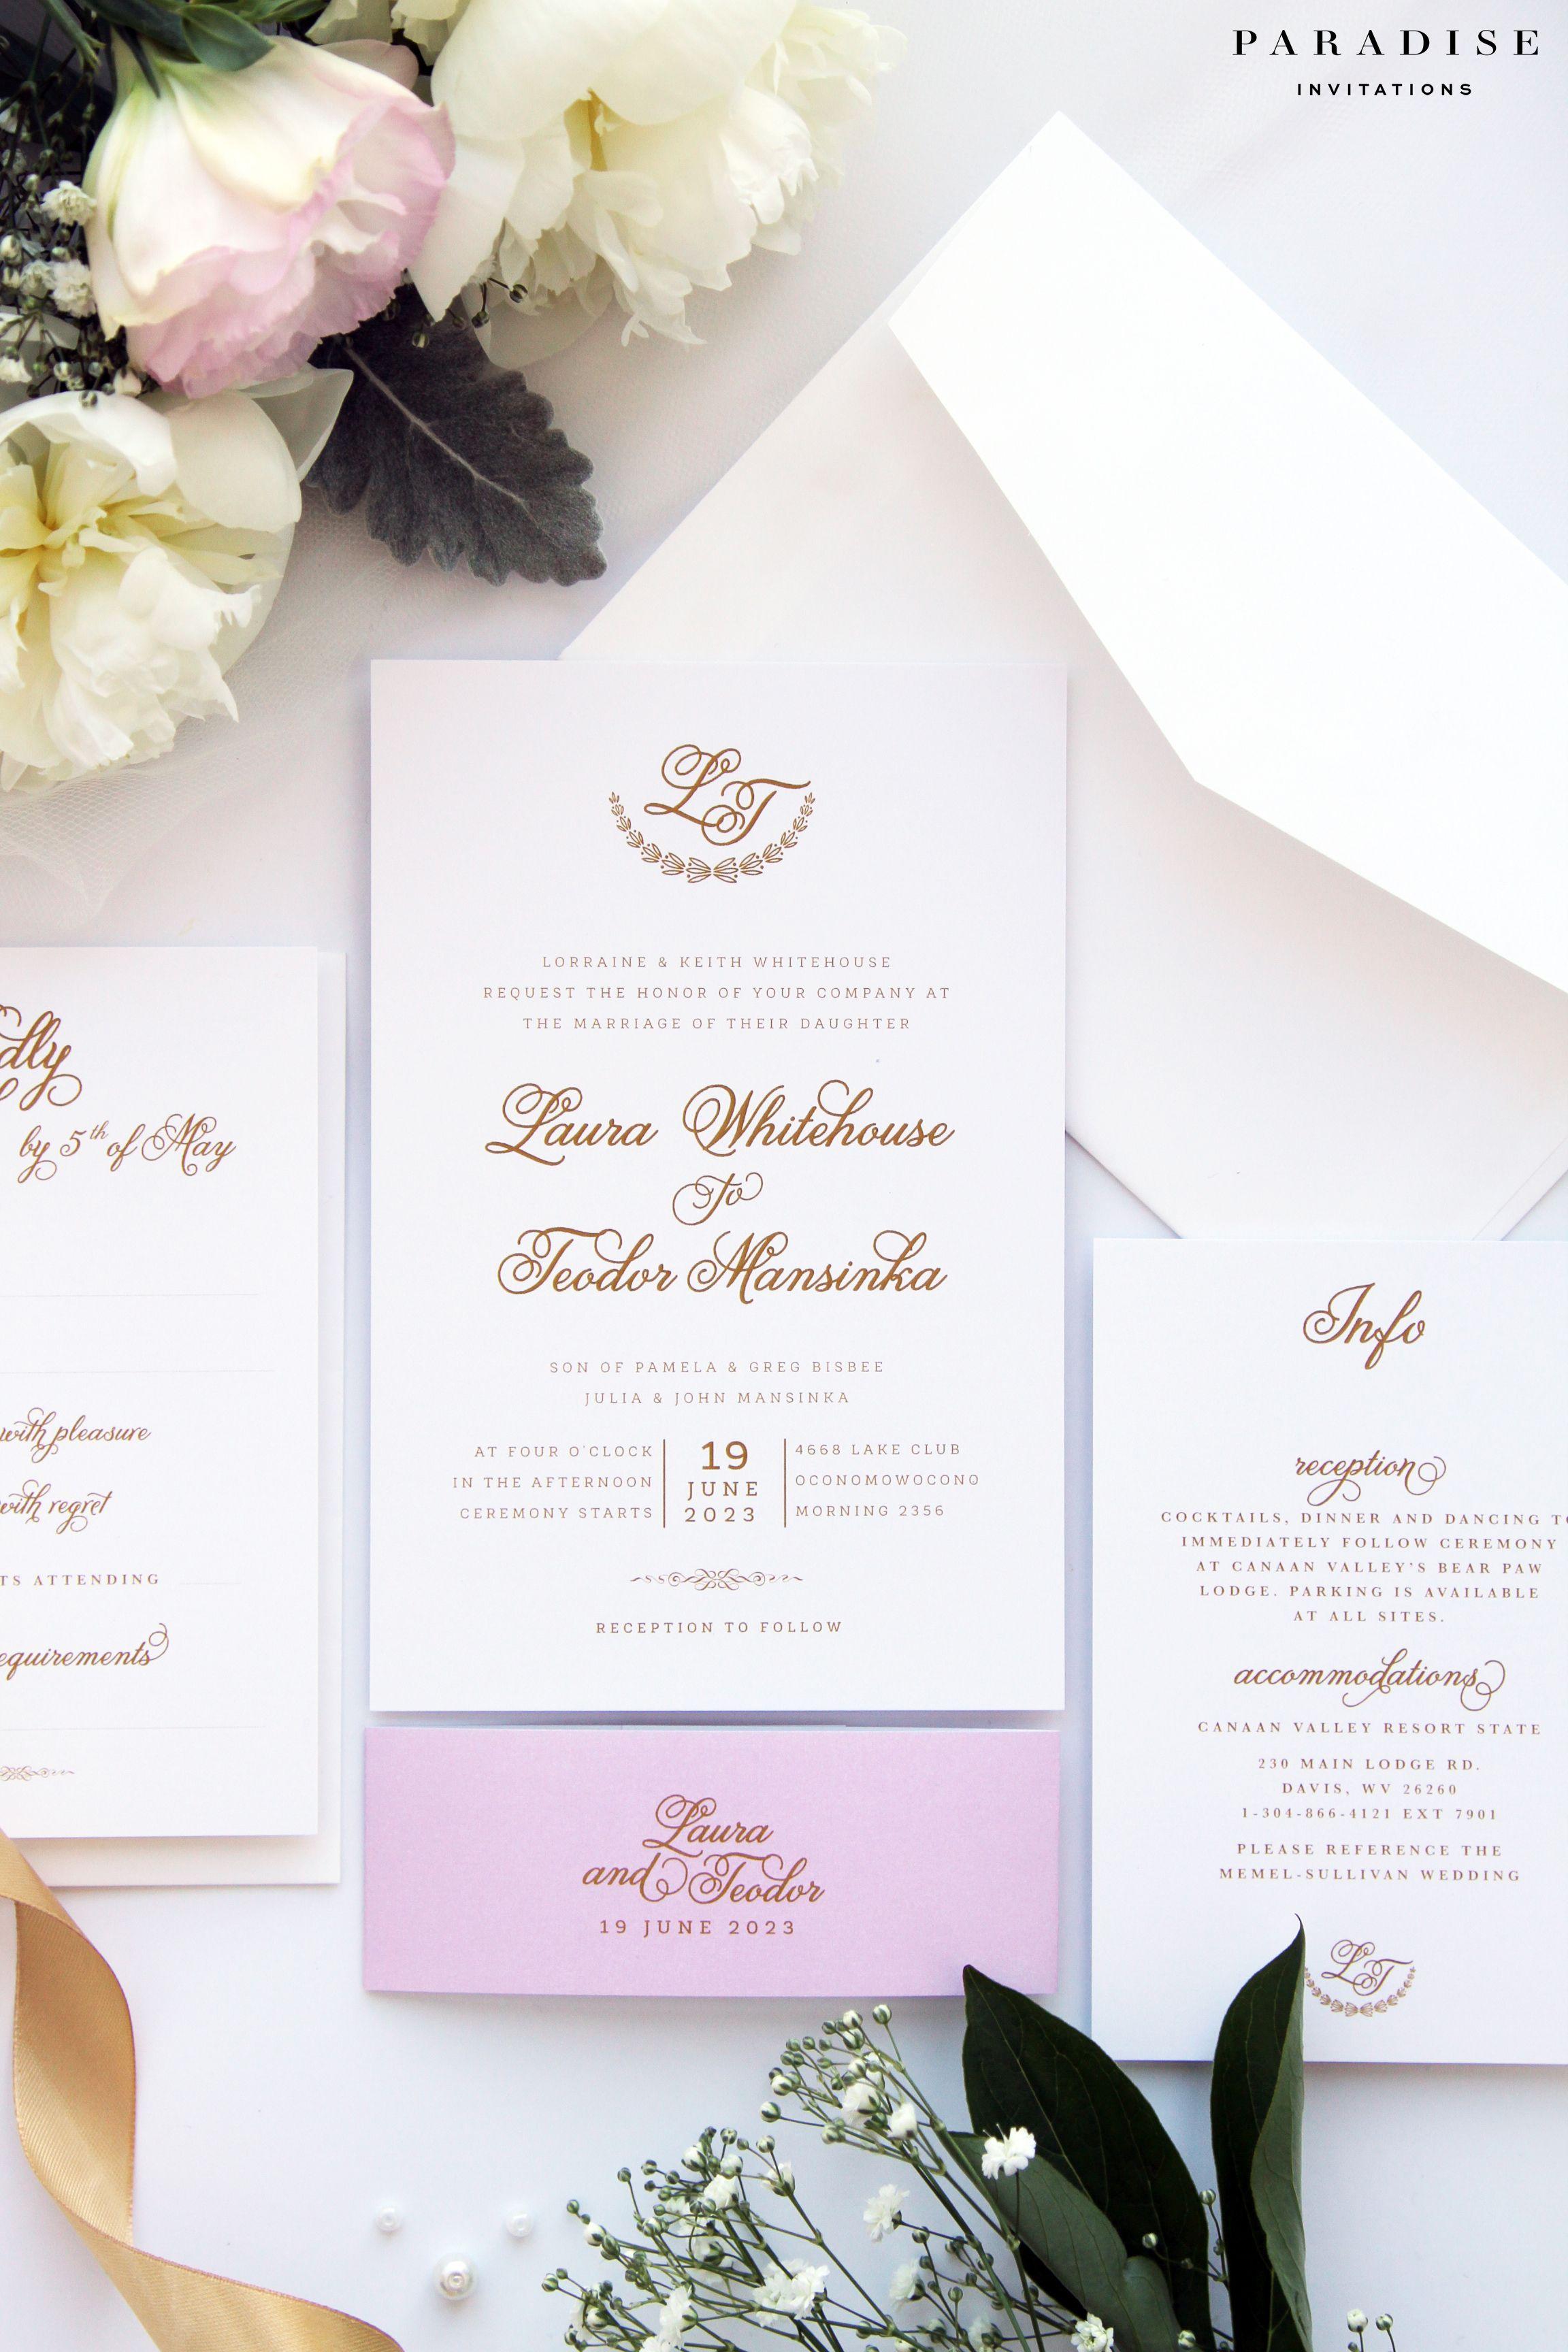 Anne Lise Wedding Invitation Sets Modern Calligraphy Invitations Wedding Invitation Kits Printable Or Printed Vellum Covers Vellum Paper Wedding Invitations Pink Wedding Invitations Modern Calligraphy Invitation